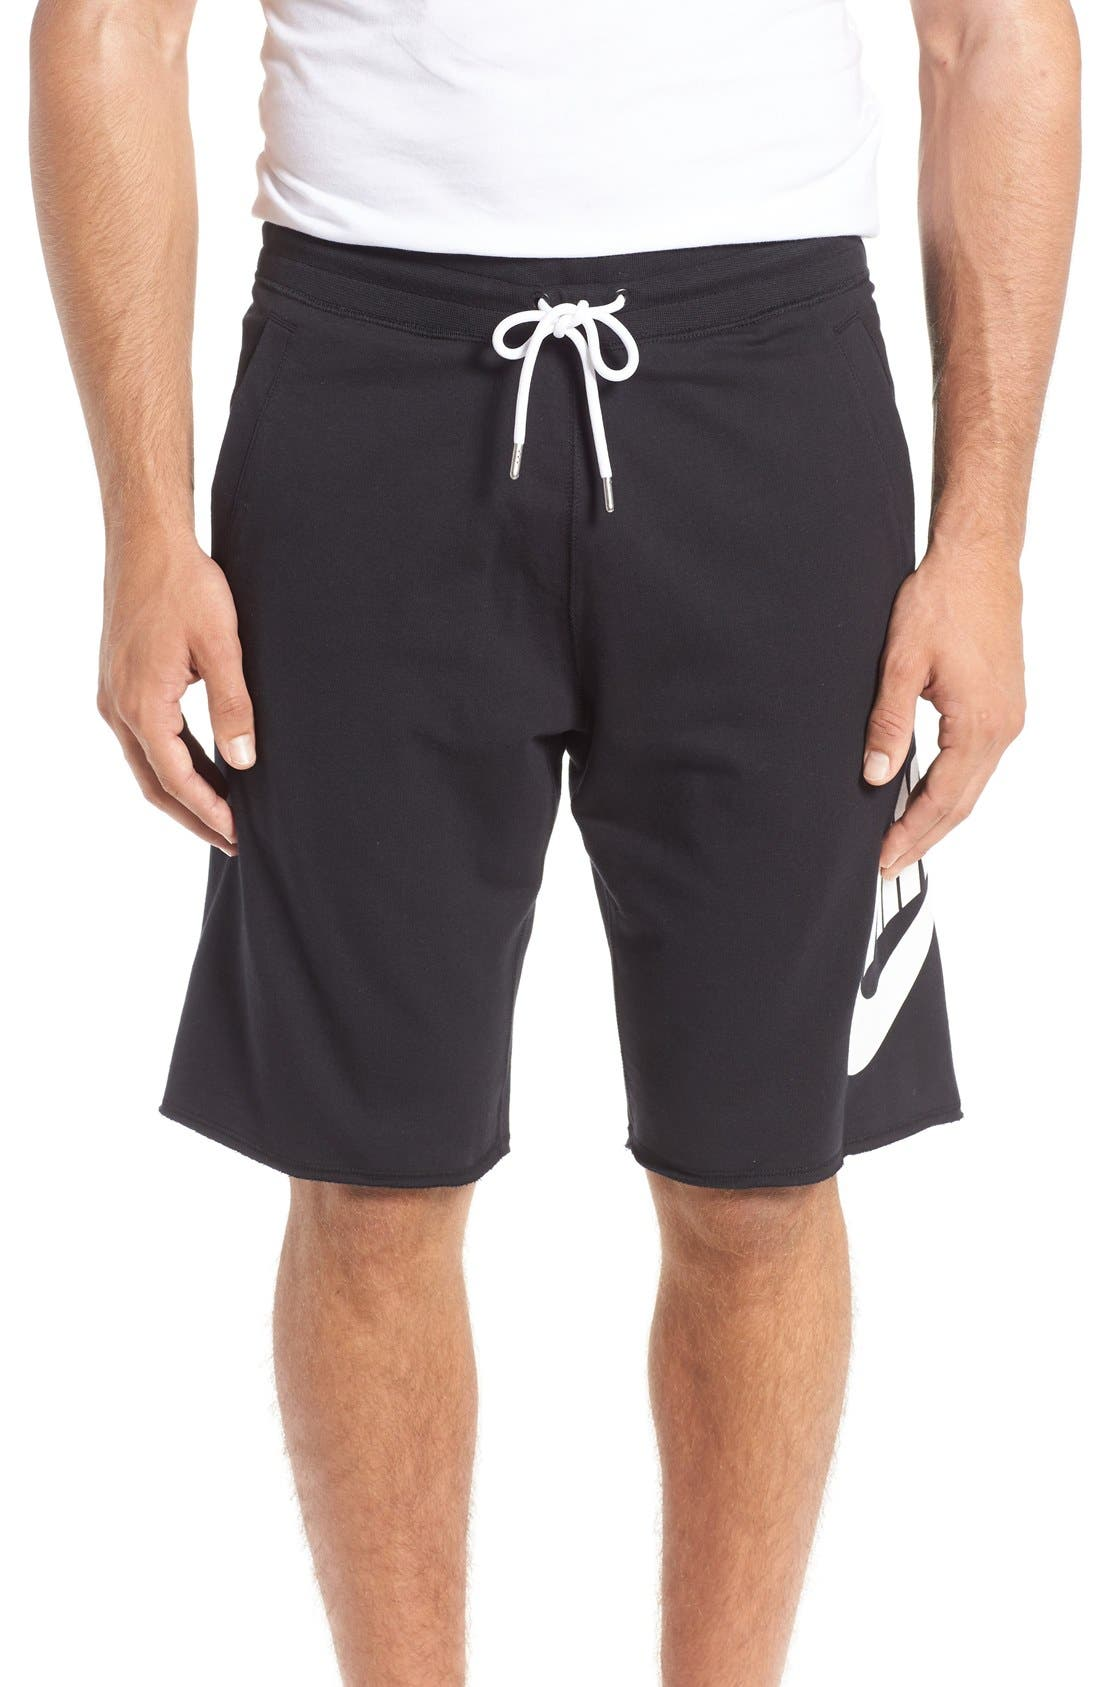 Alternate Image 1 Selected - Nike 'NSW' Logo French Terry Shorts